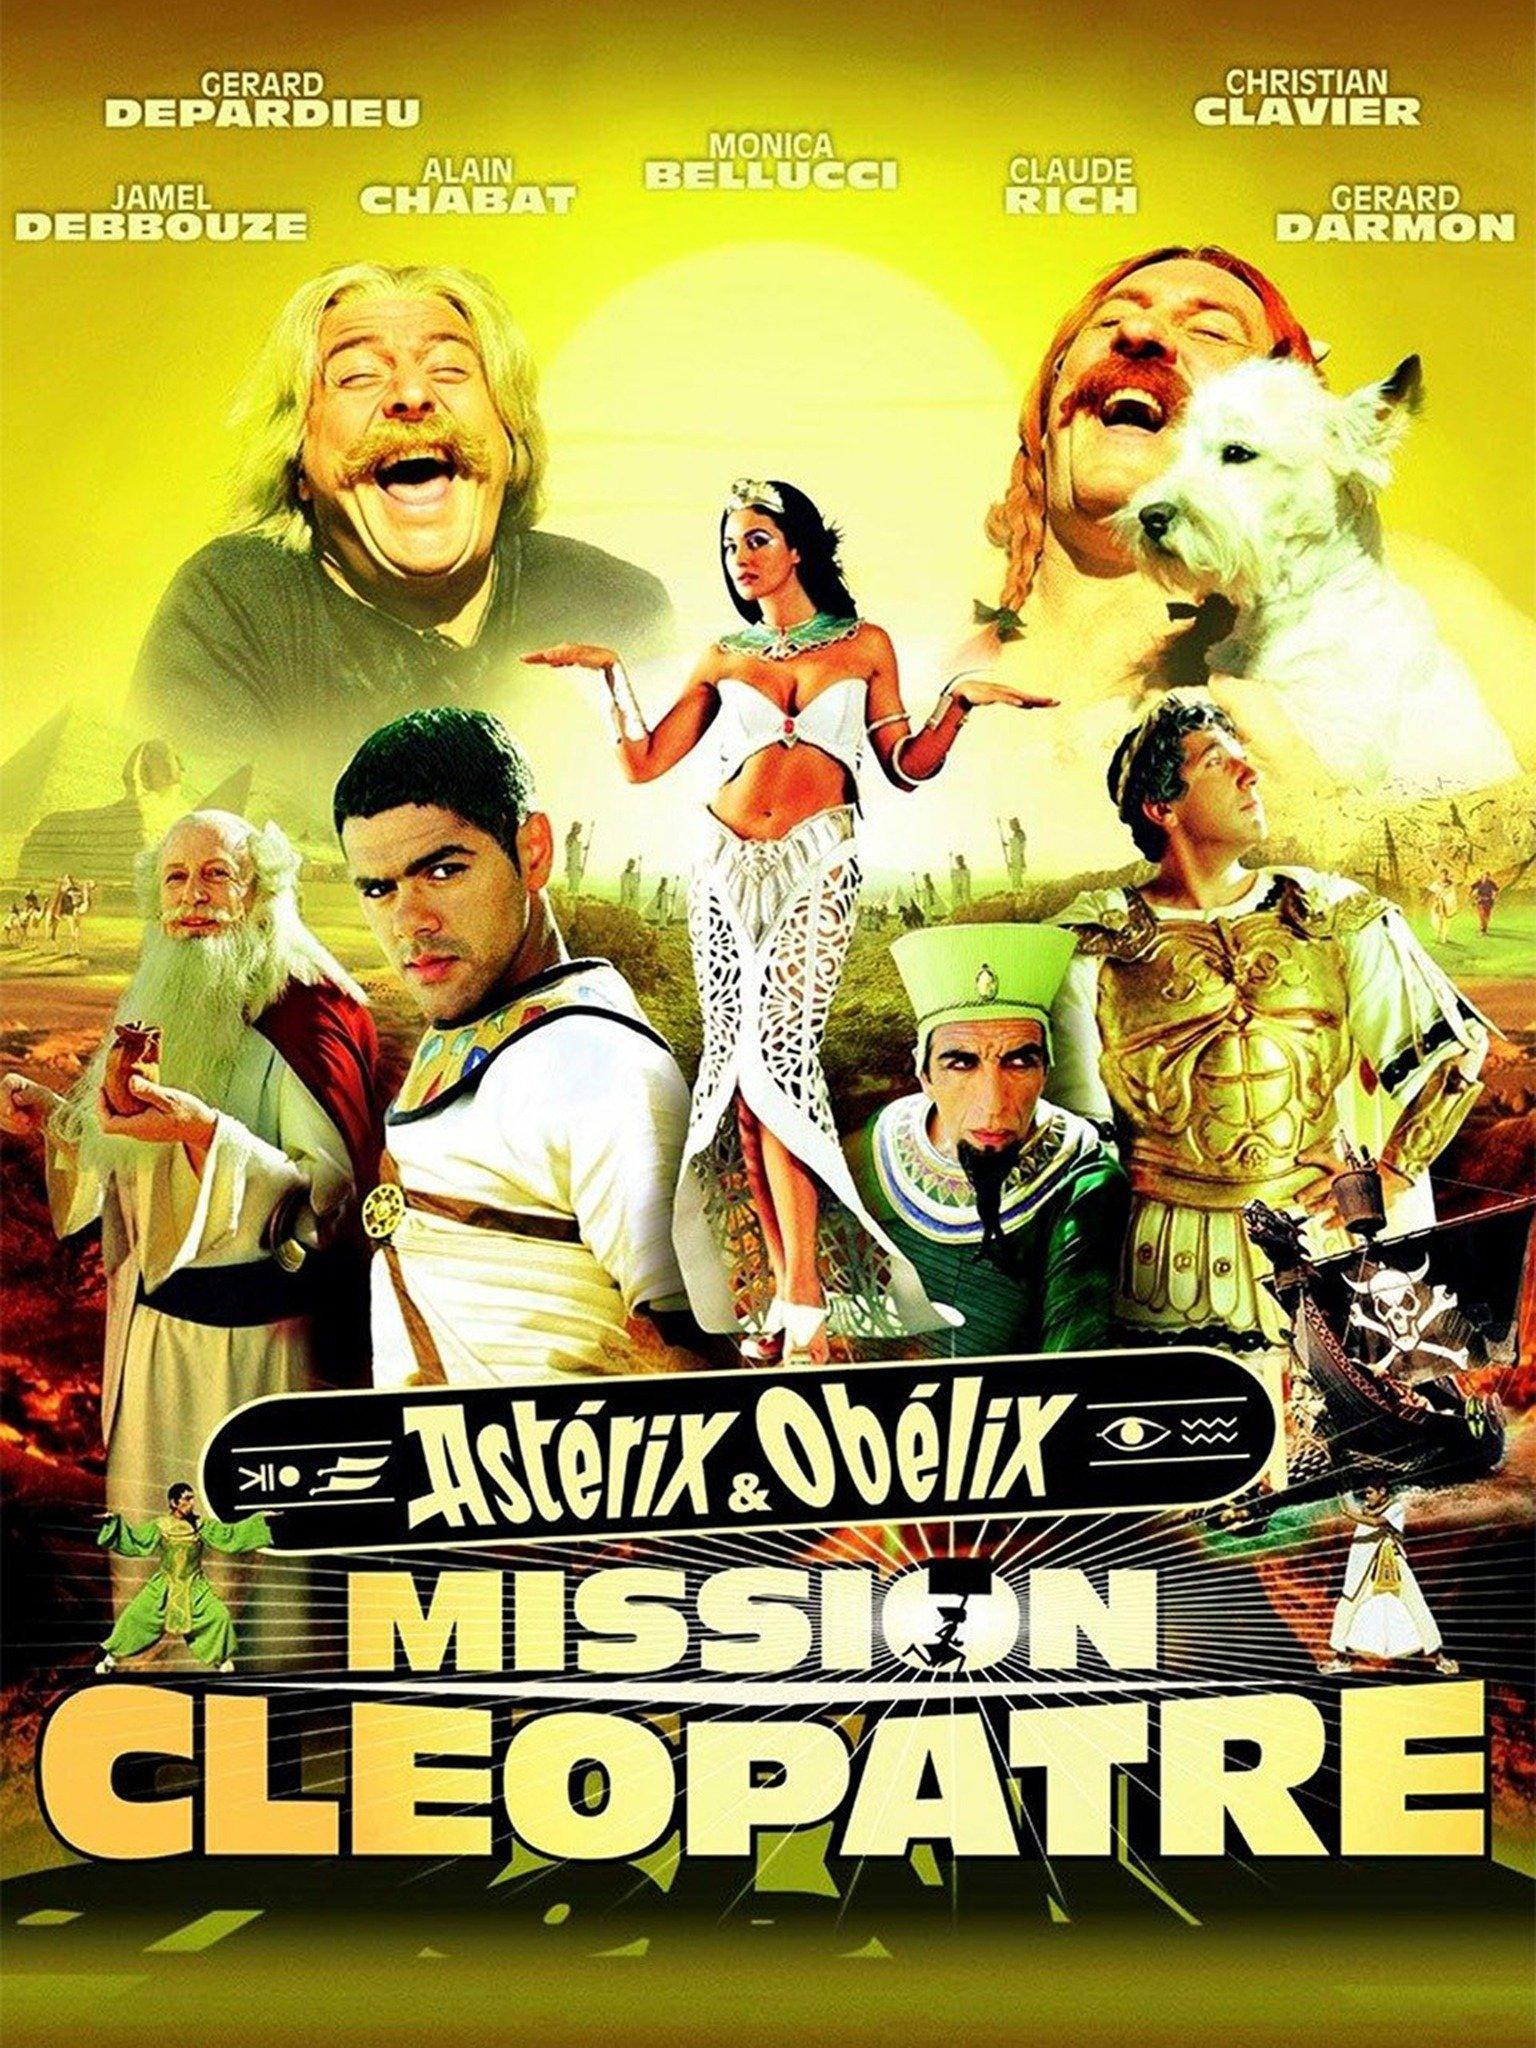 Asterix Obelix Mission Cleopatre 2002 Rotten Tomatoes